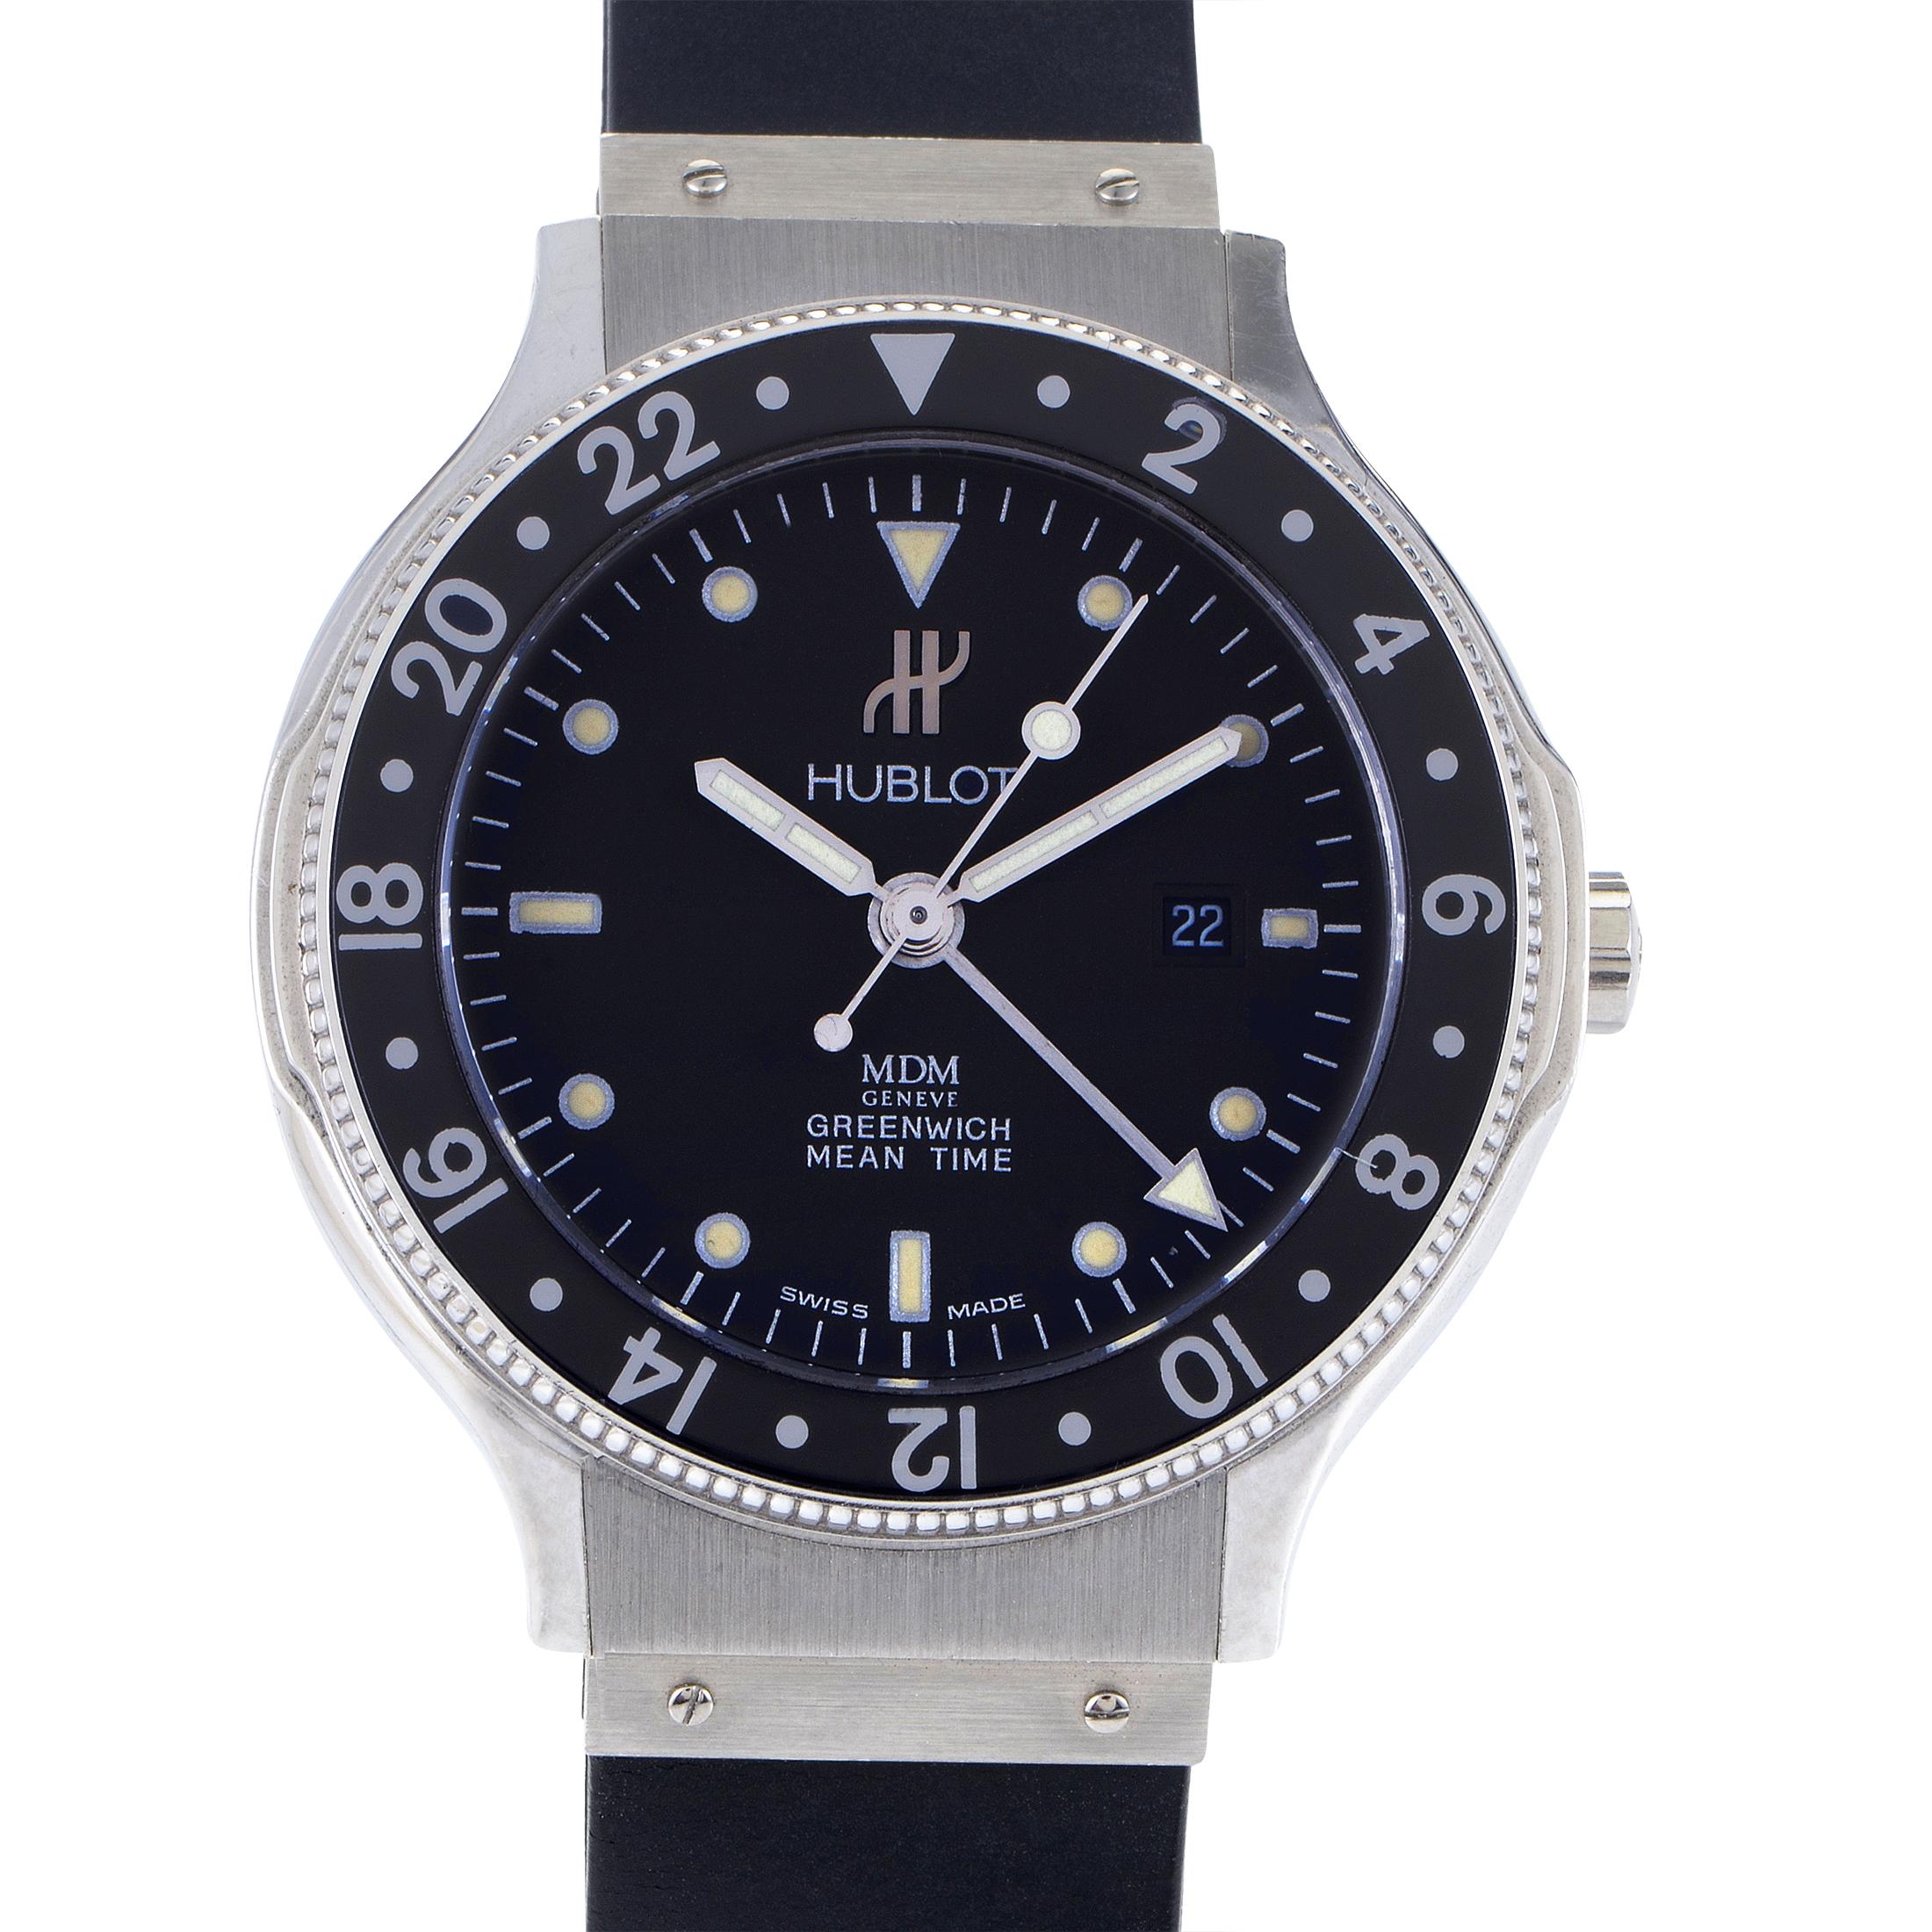 Hublot MDM Geneve Greenwich Mean Time Unisex Quartz Watch H147.140.1